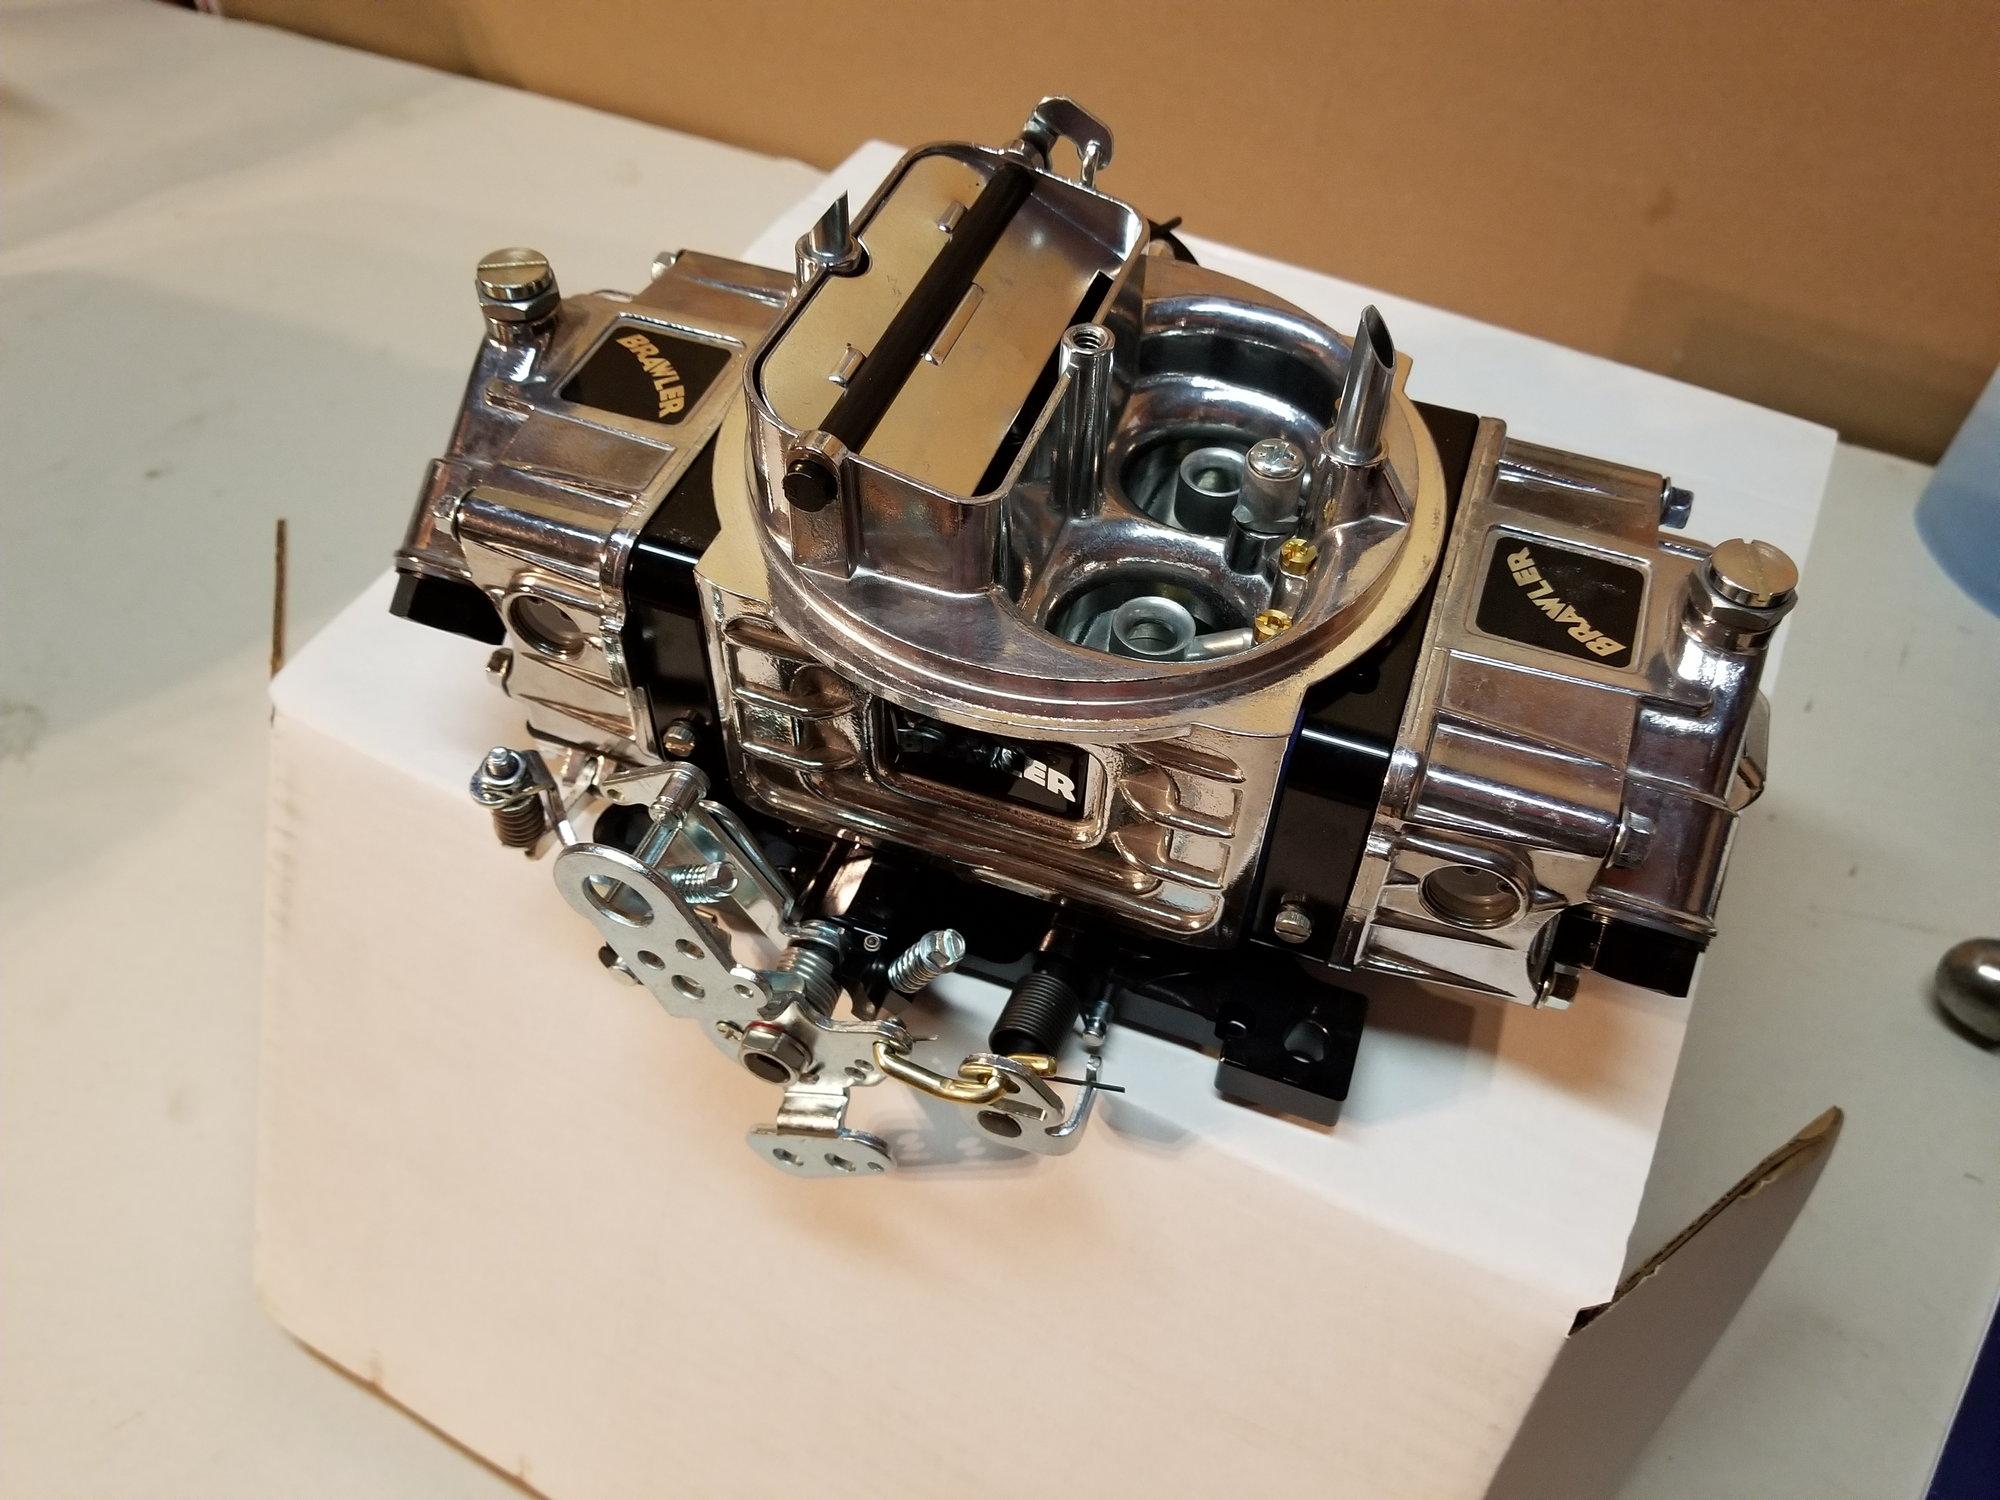 Starting The Teardown On My 69 F100 Crown Vic Build